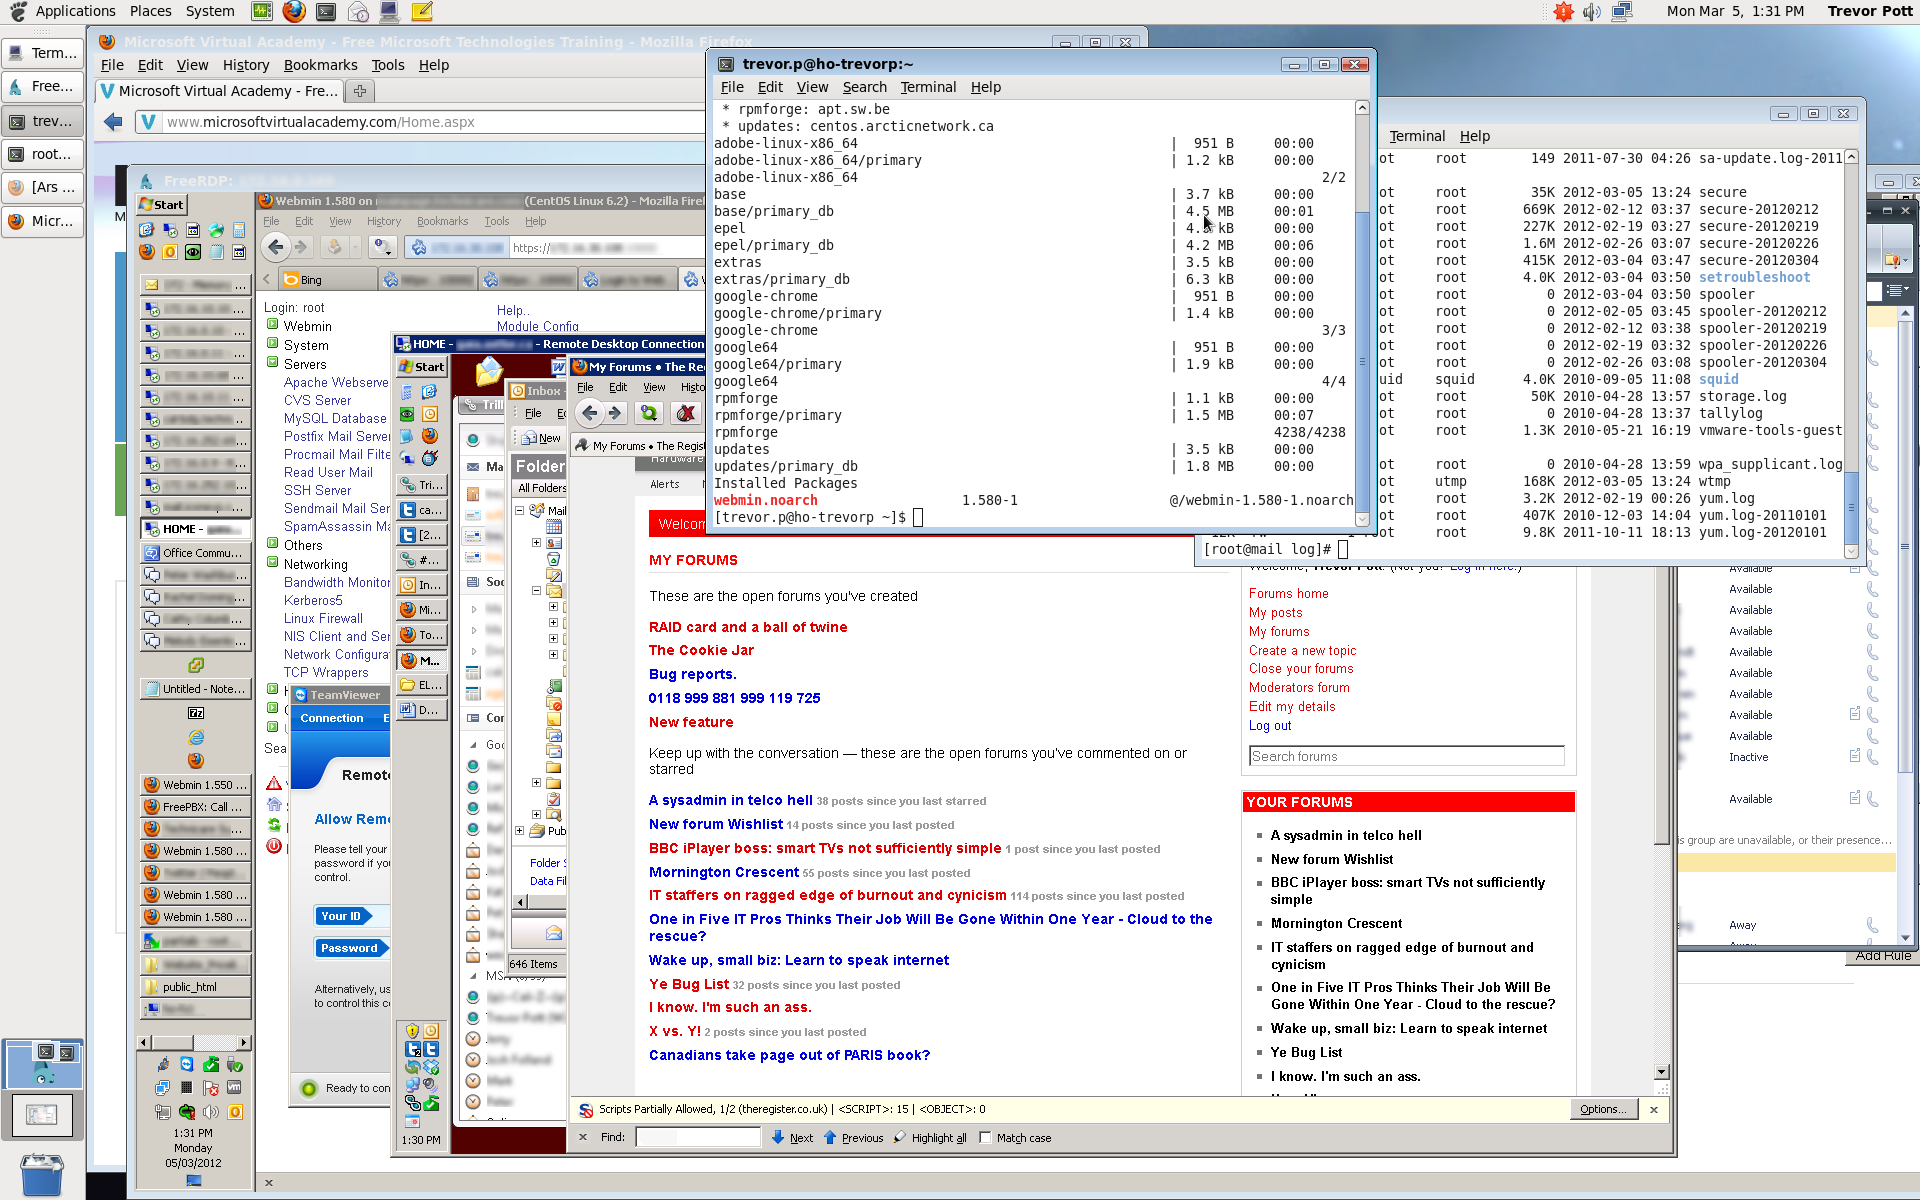 win8 desktop big